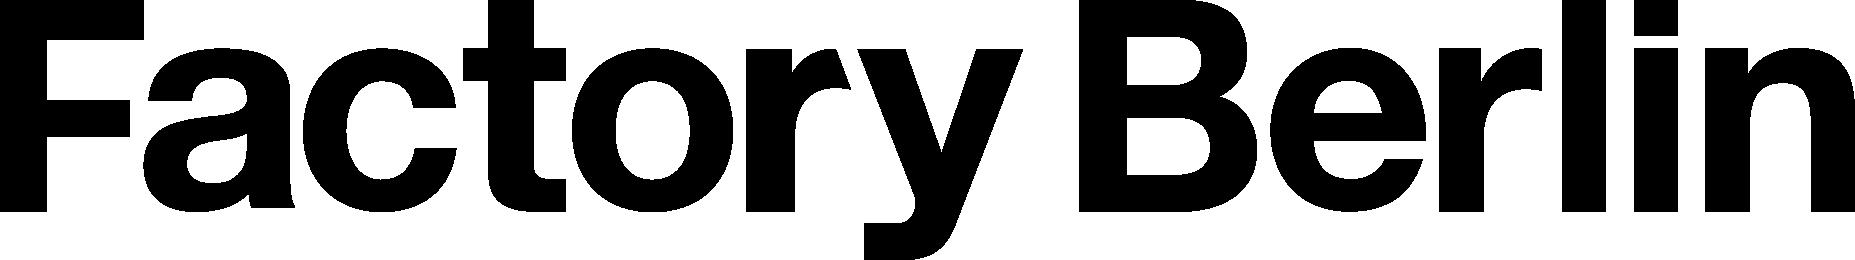 2019-factoryberlin_logo_black (1).png